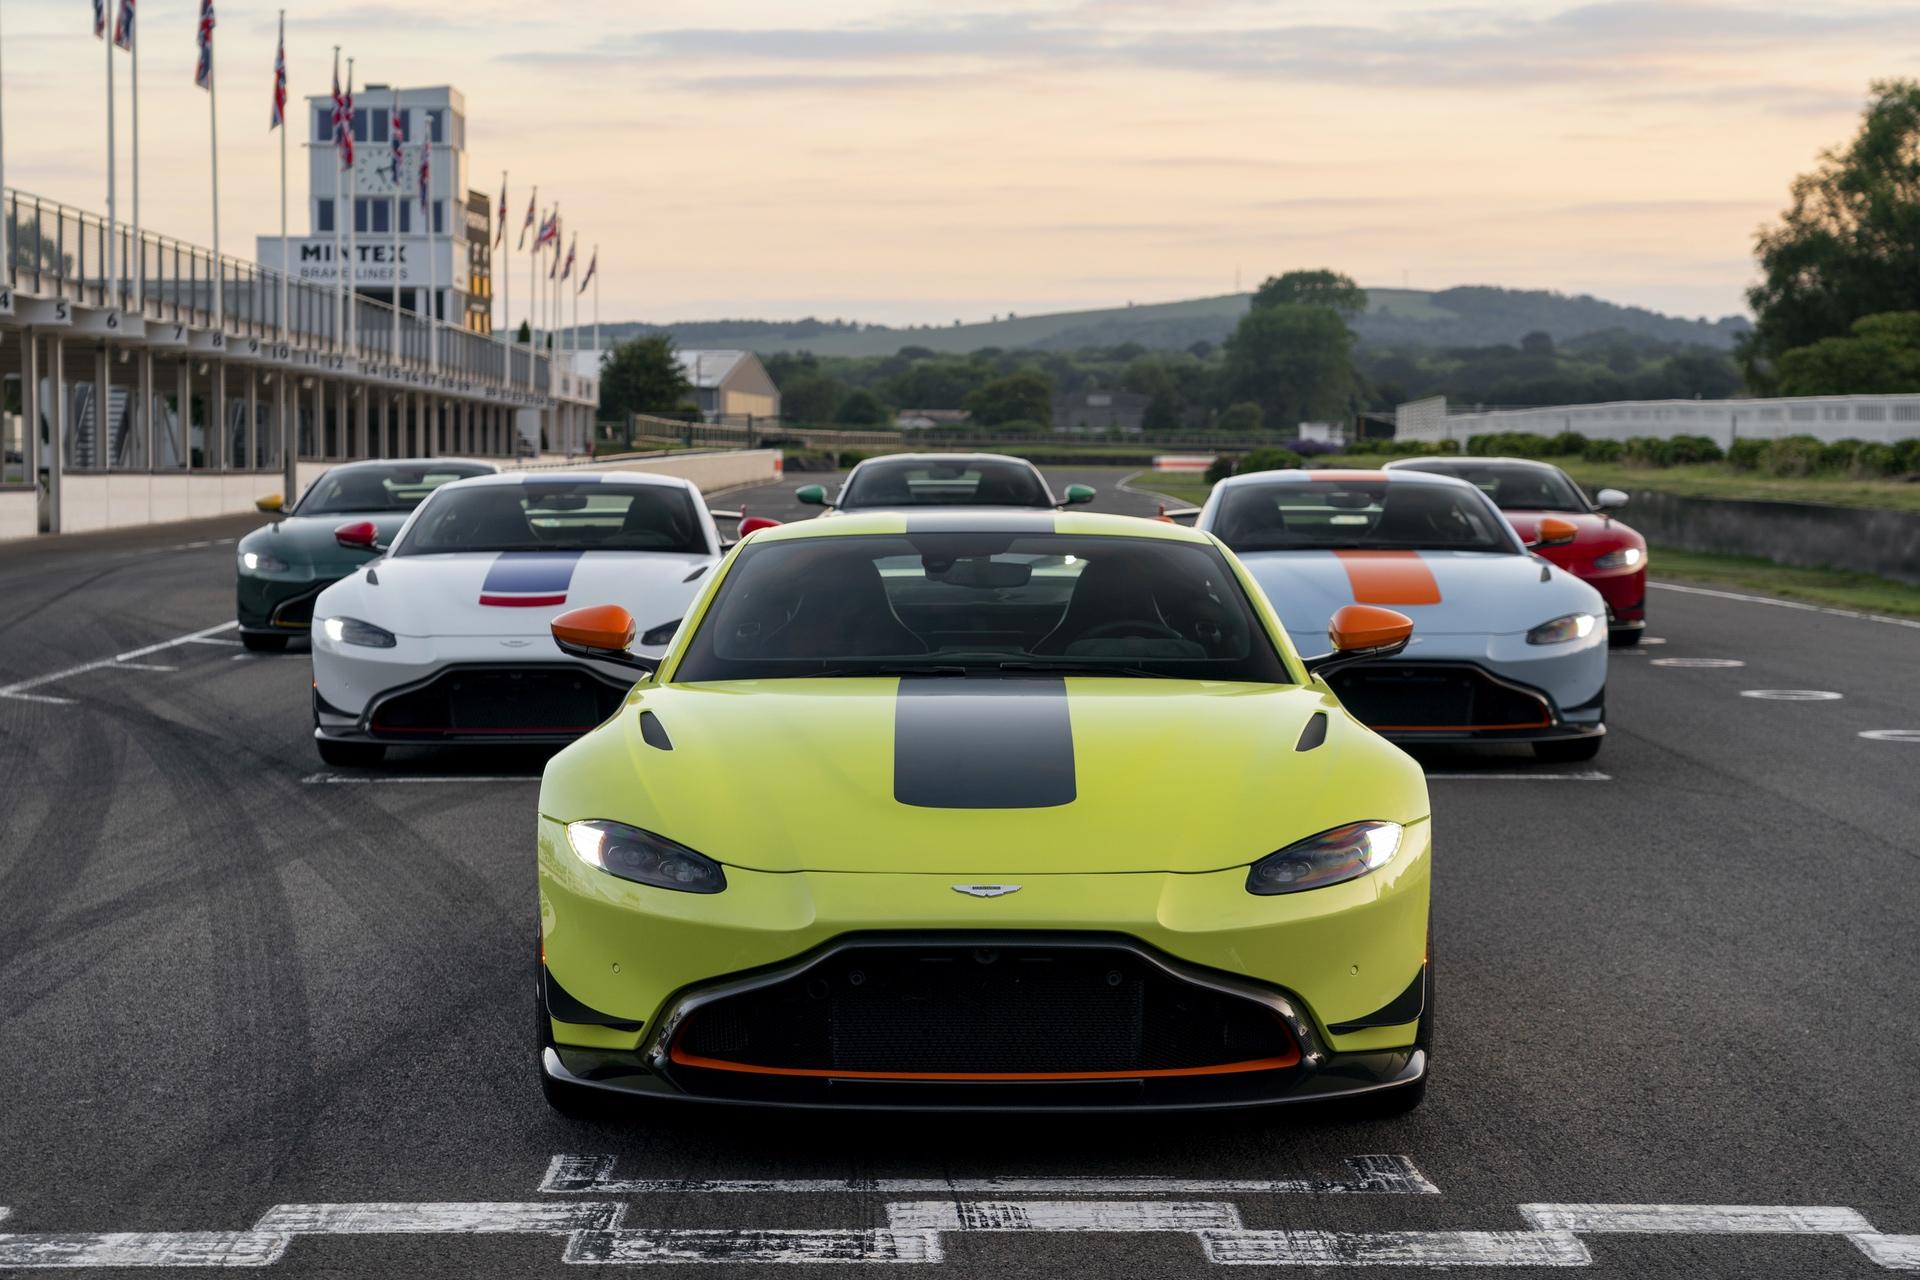 Aston-Martin_Goodwood-FoS-2019_04